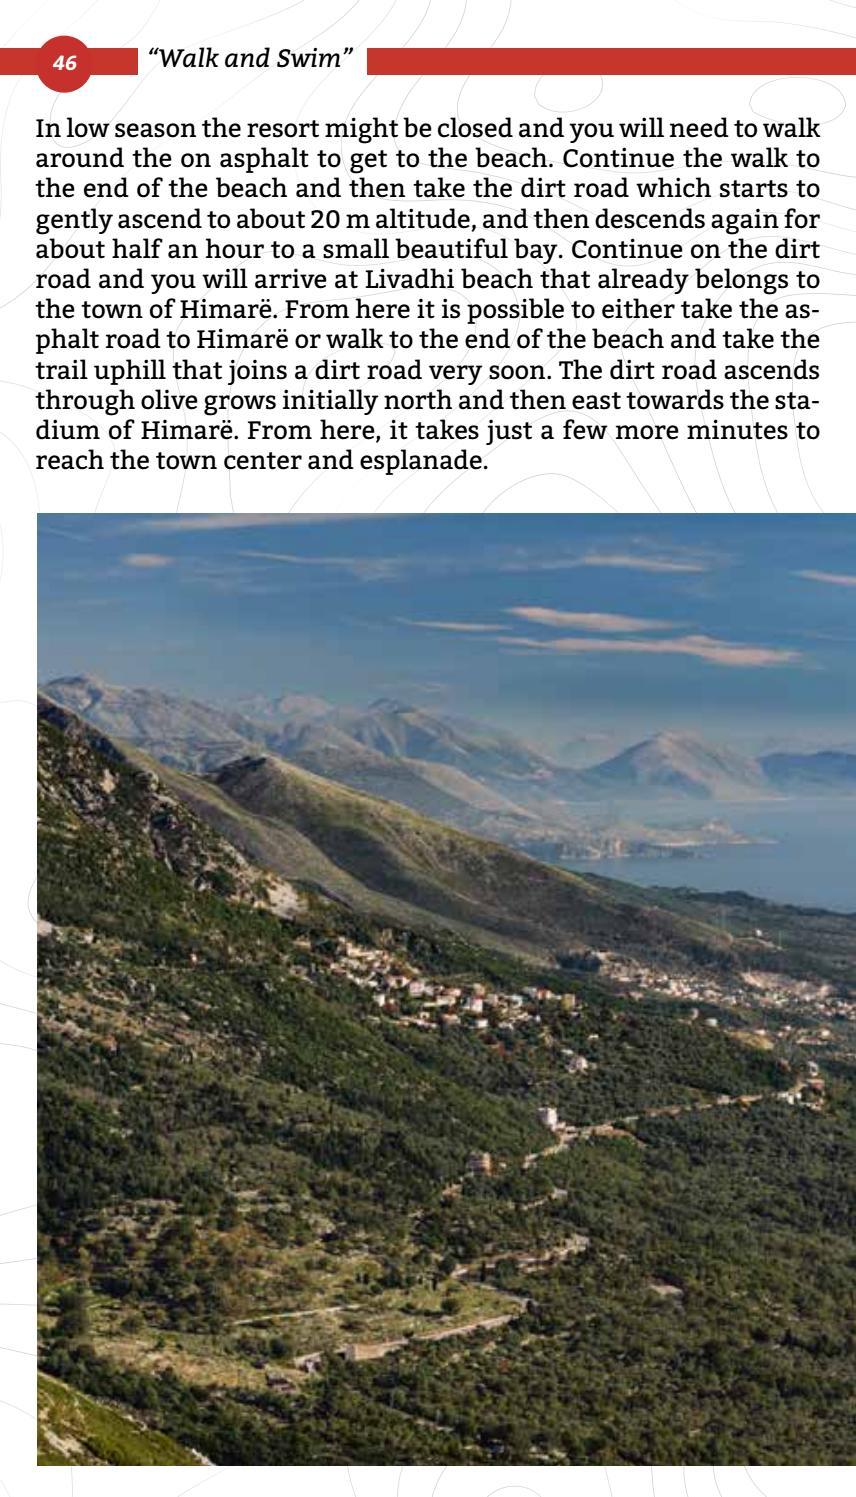 Hiking Trails in Himara Region page 46